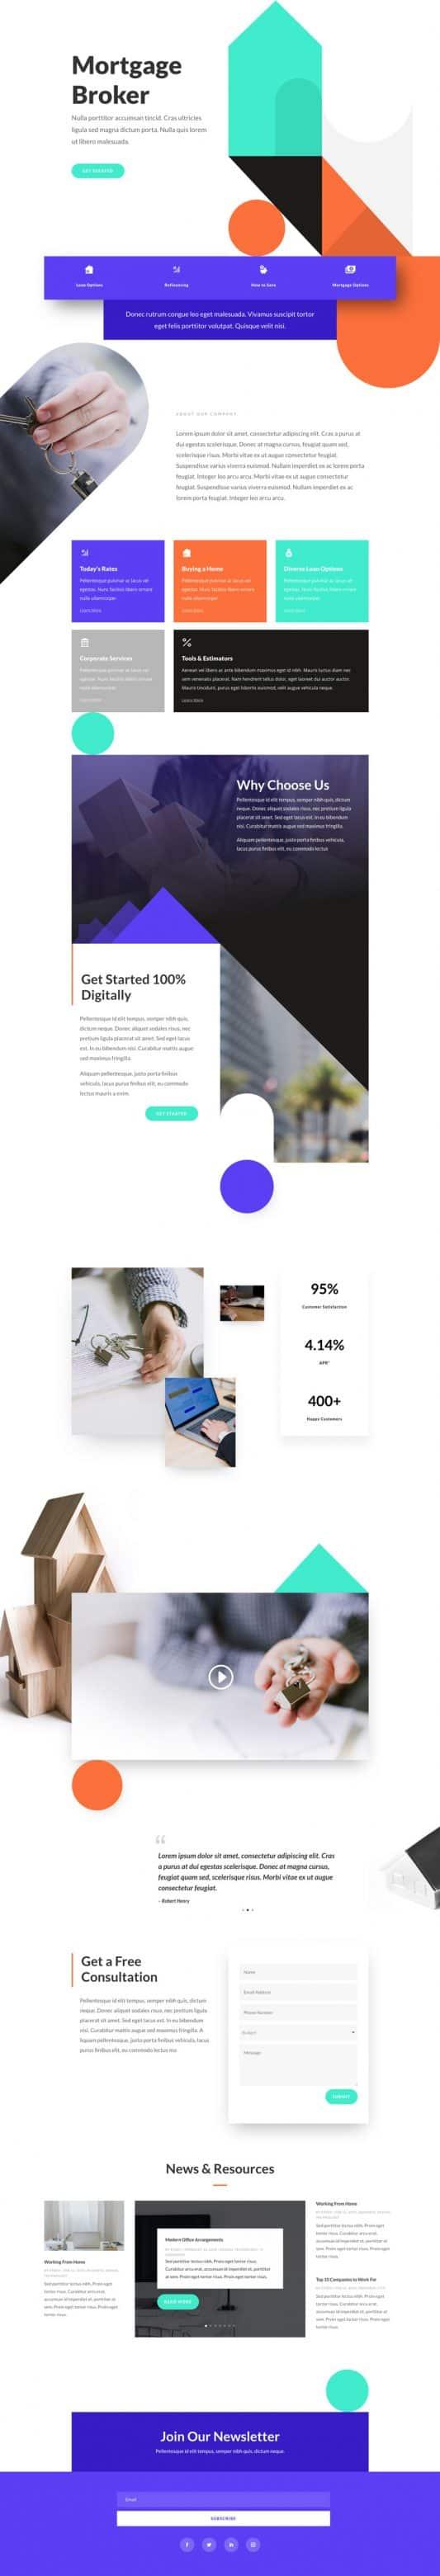 Mortgage Broker Web Design 6